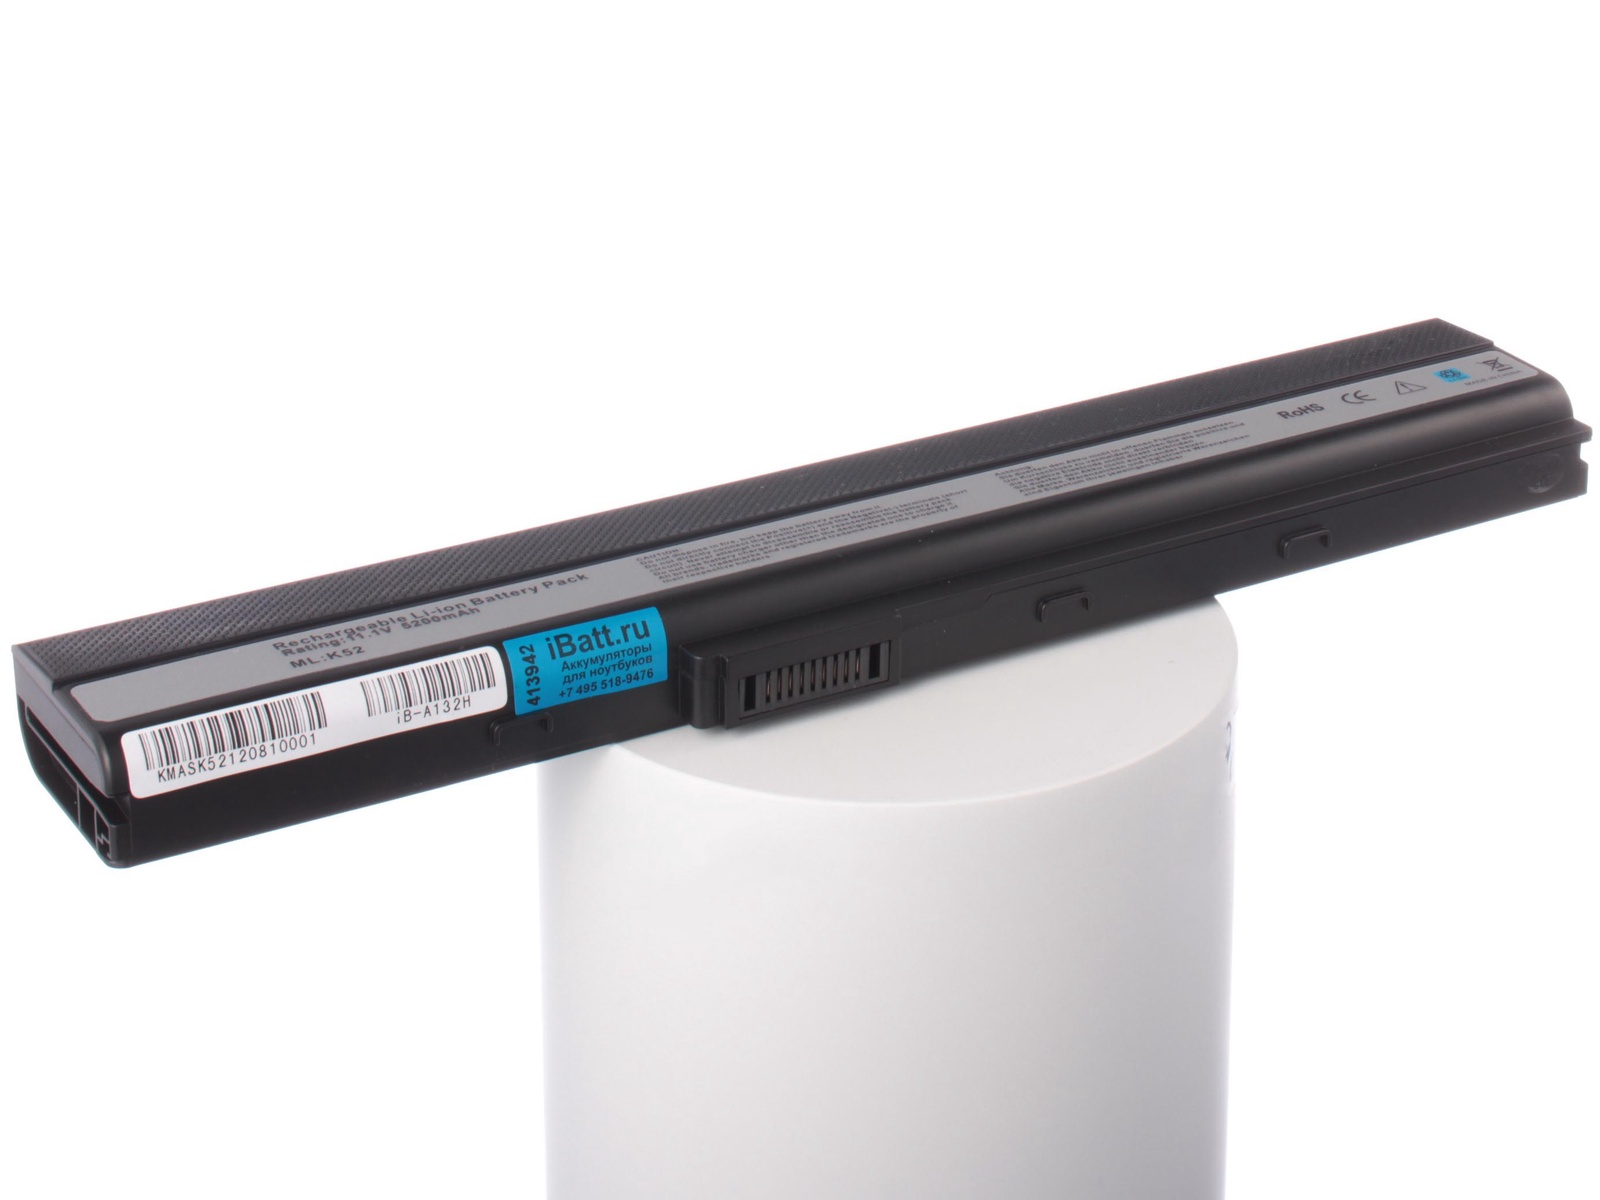 Аккумулятор для ноутбука iBatt Asus A32-K52, A42-K52, A41-K52, A42-B53, 90-NYX1B1000Y, A32-B53, 70-NXM1B2200Z, A41-B53, A31-K52, A31-B53 все цены